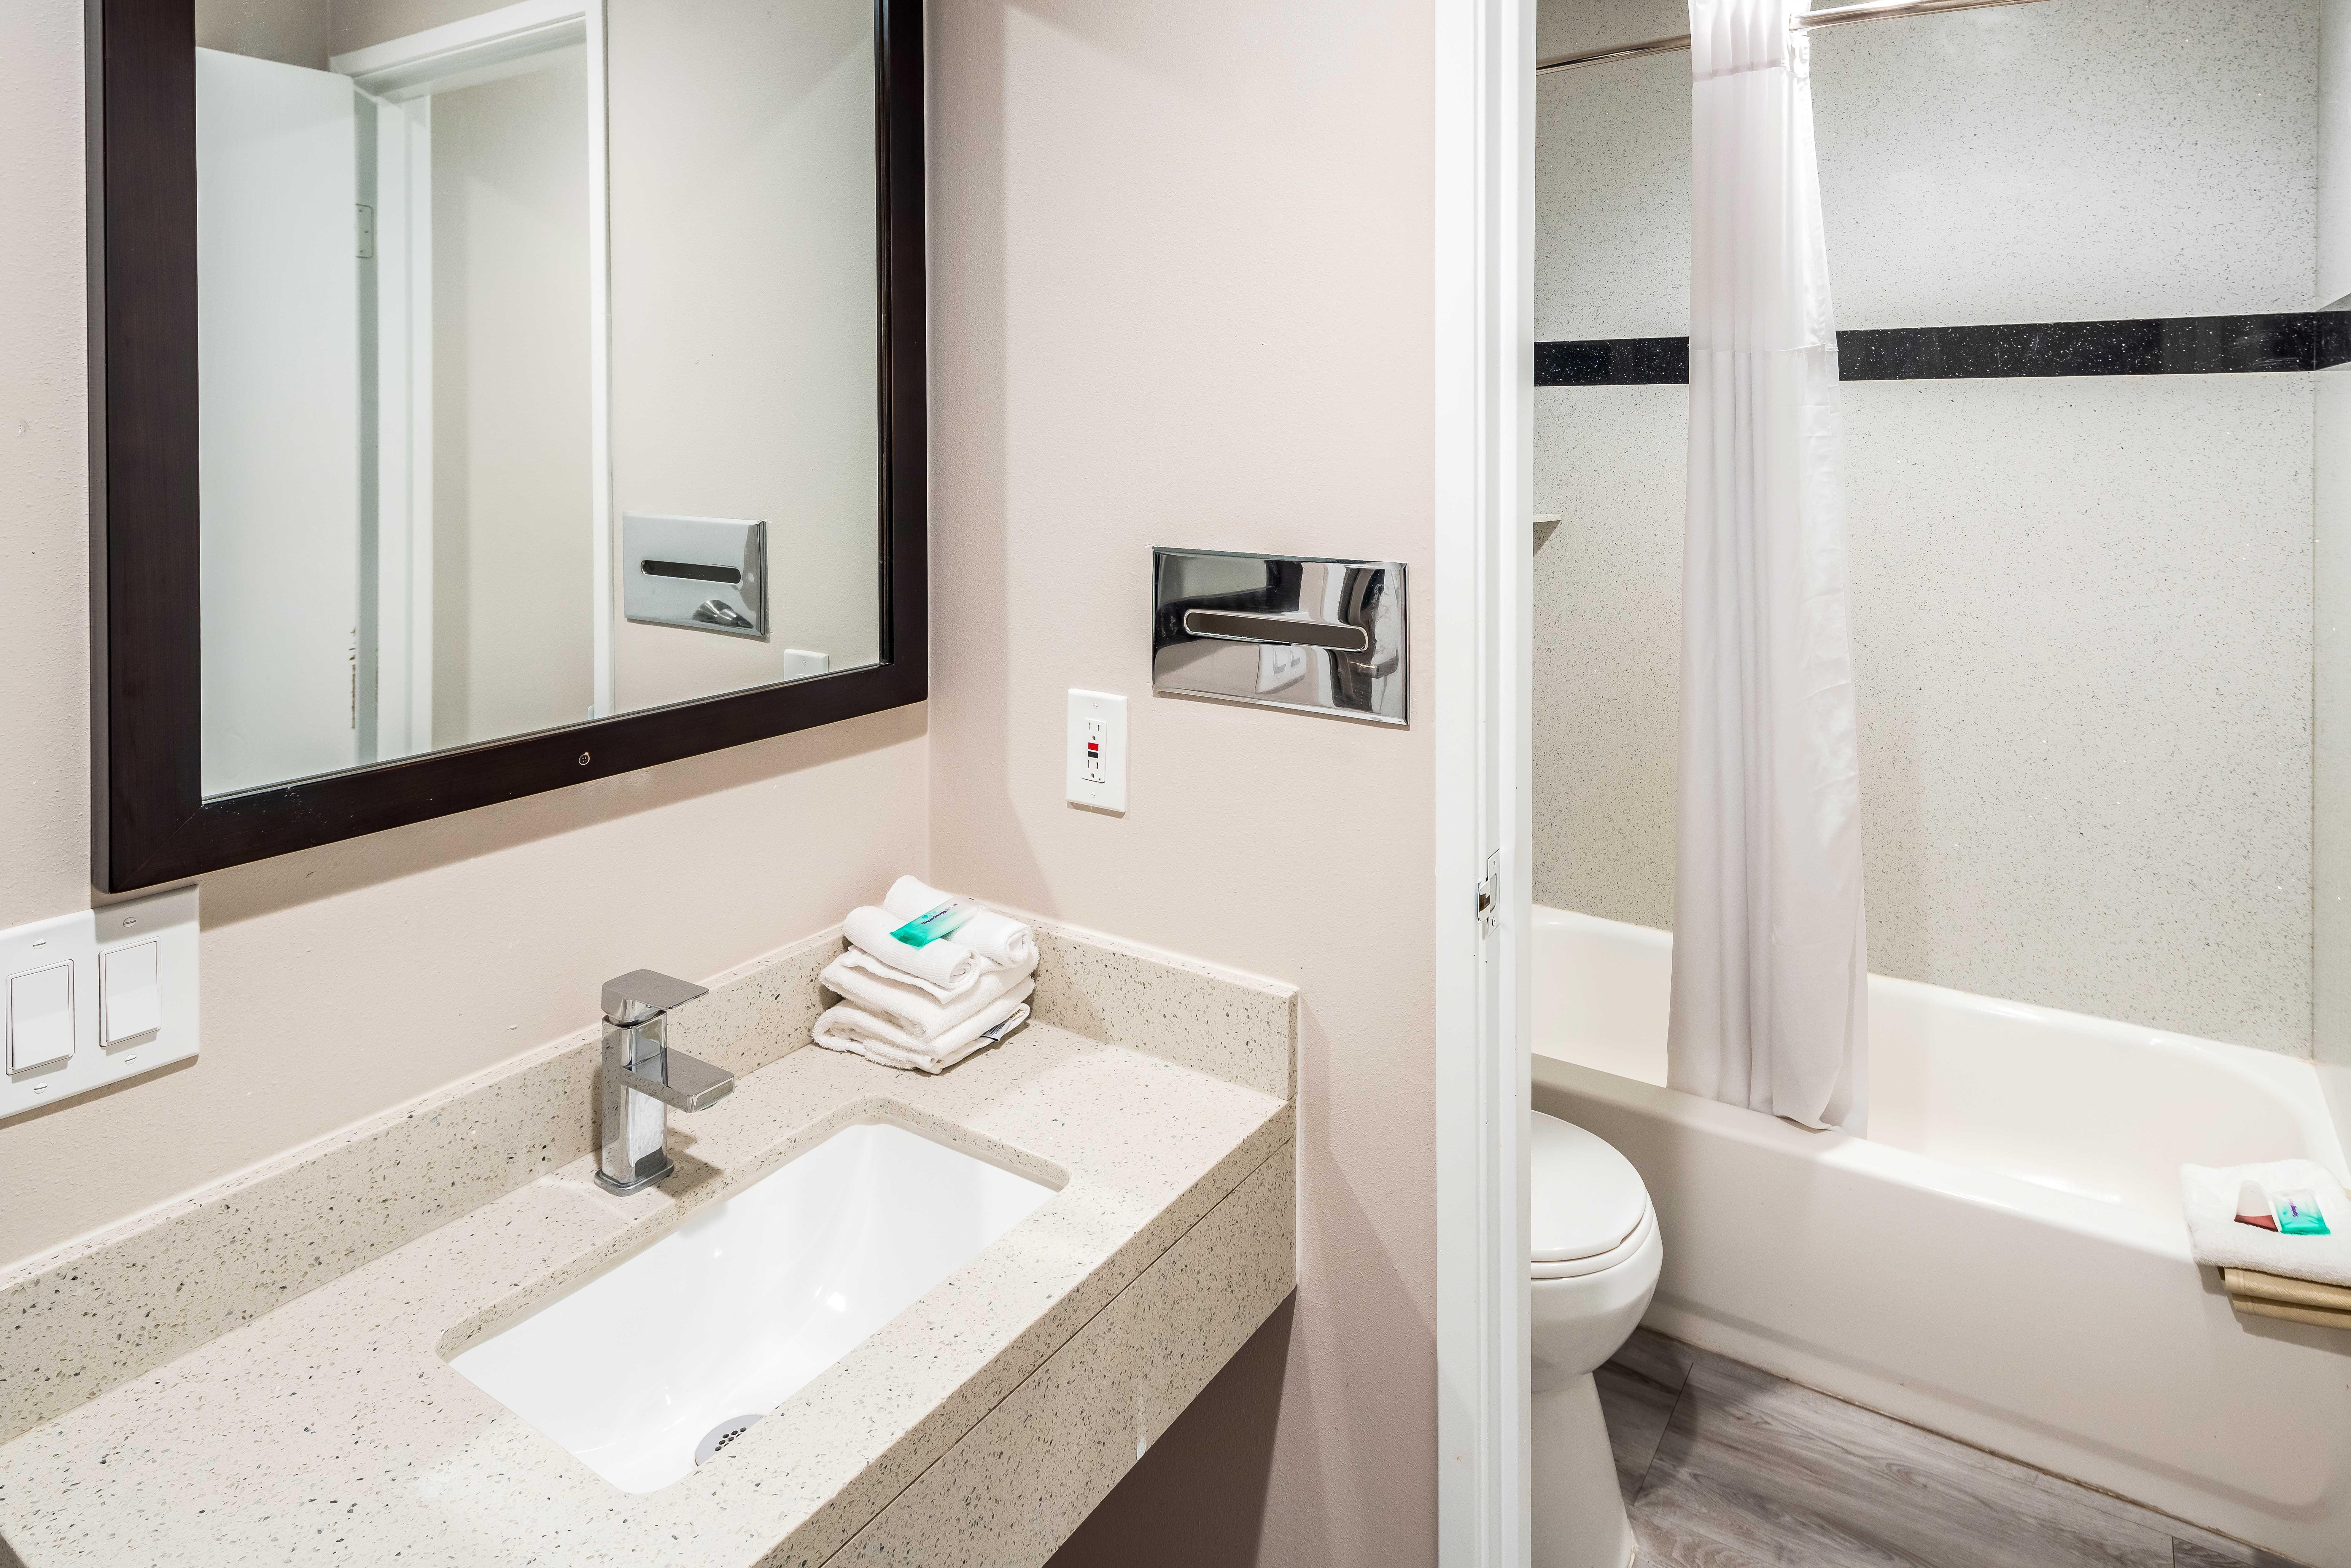 https://www.hotelsbyday.com/_data/default-hotel_image/2/13717/rri1073-doublequeen-03-bath.jpg